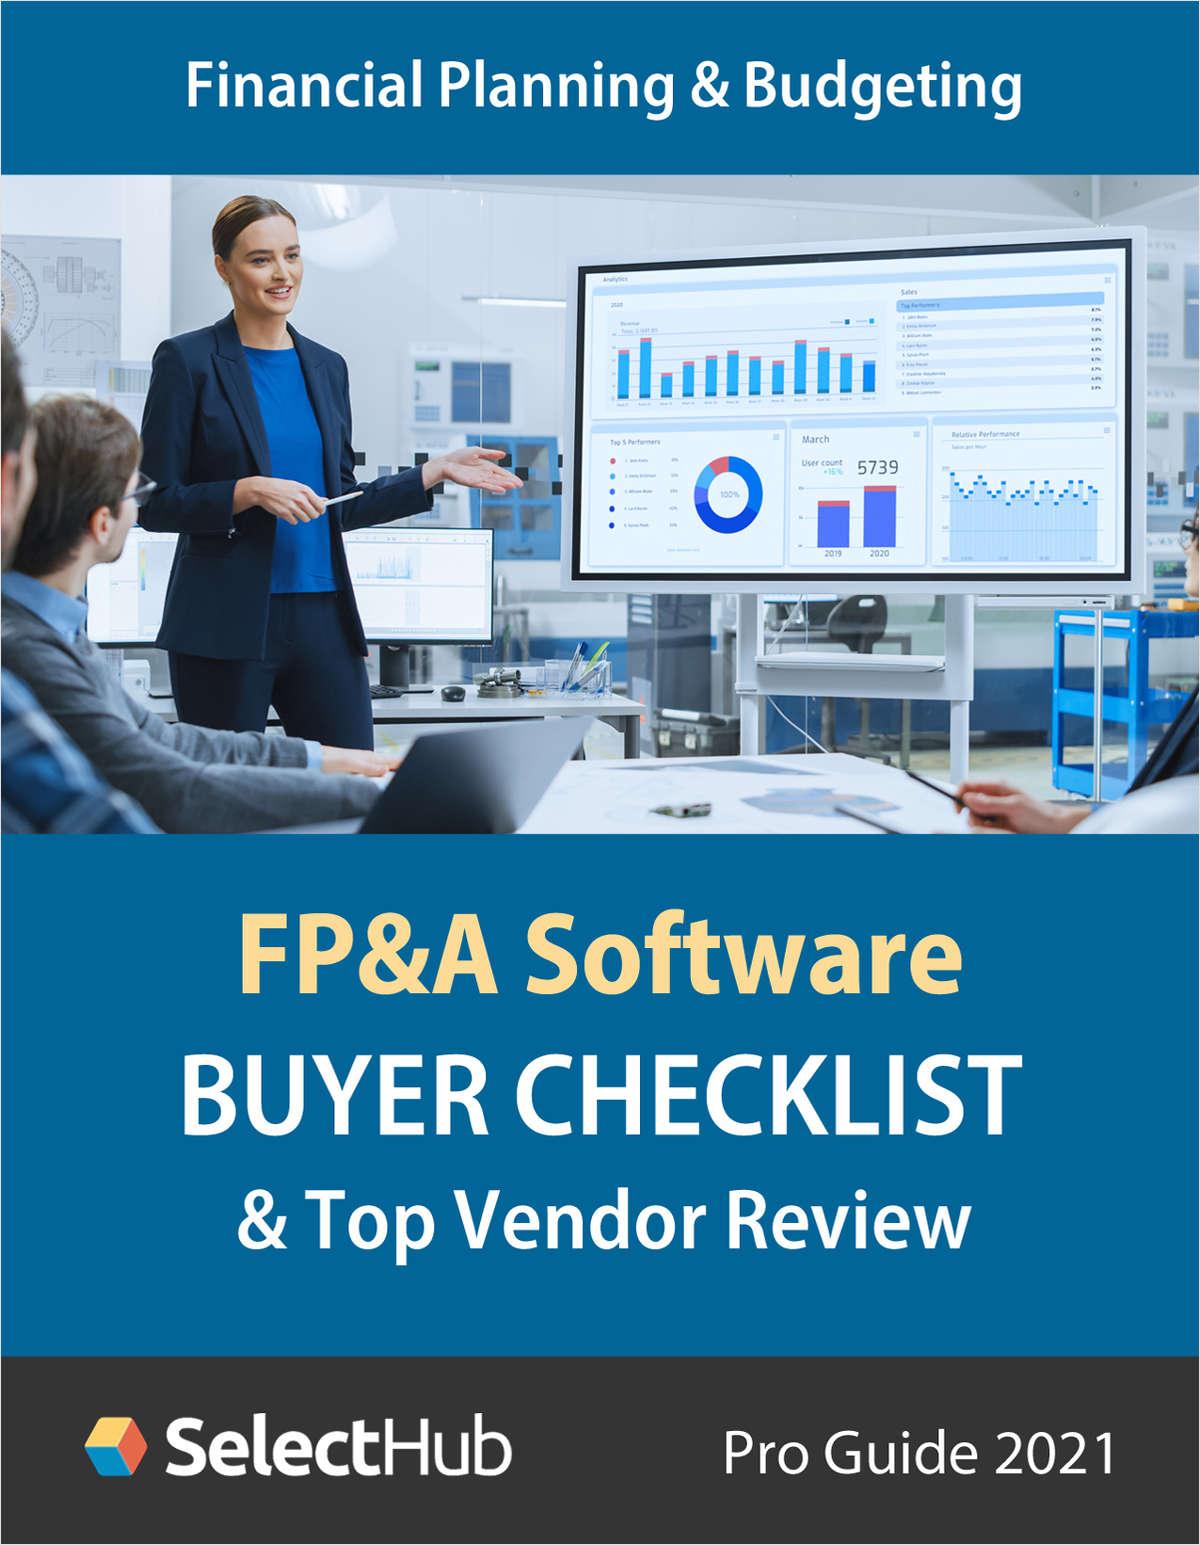 Financial Planning & Analysis (FP&A) Software Buyer Checklist 2021